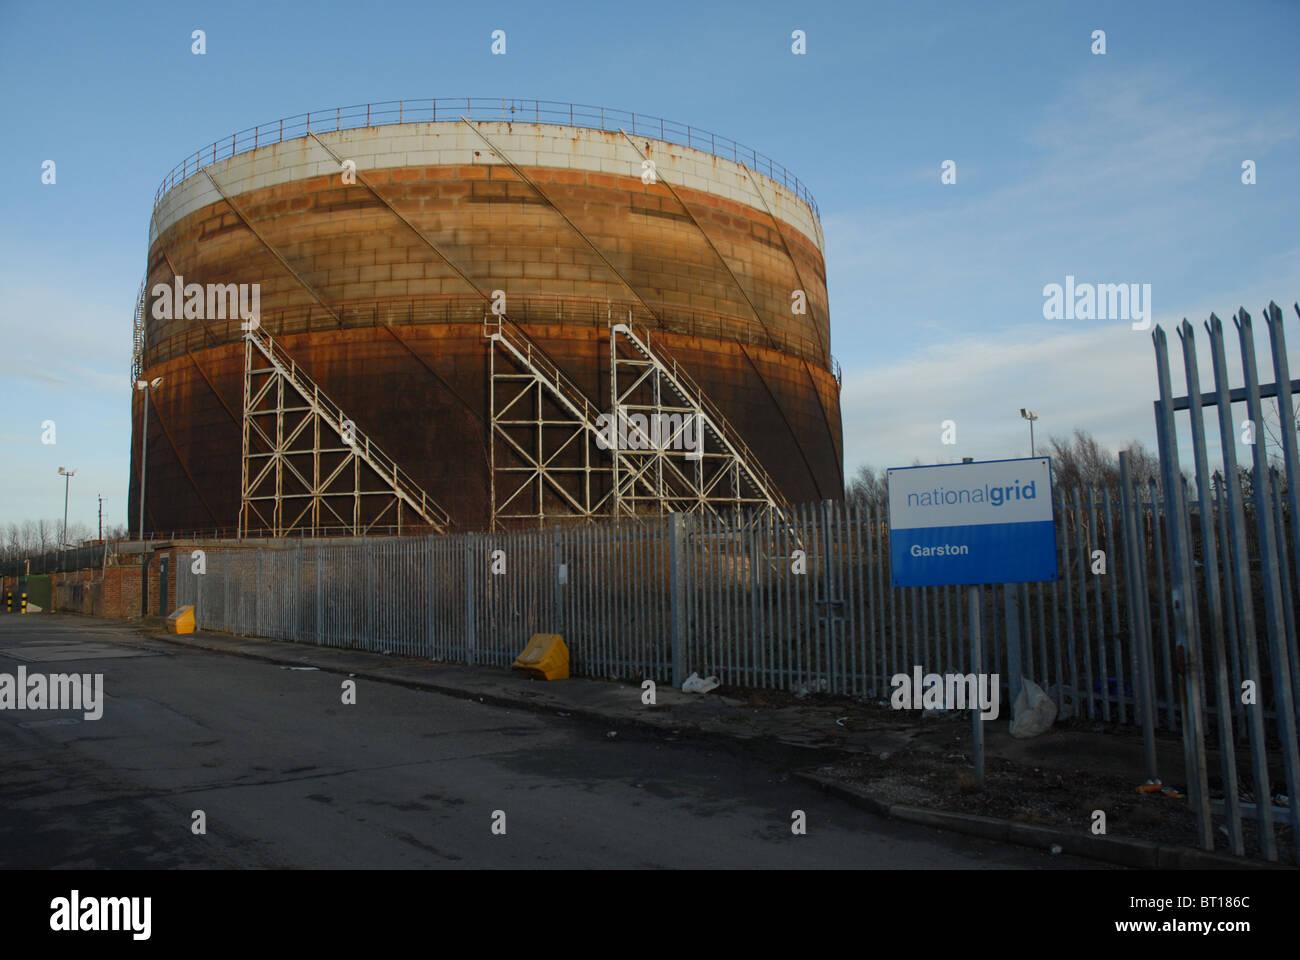 Garston Gas Works, south Liverpool, Merseyside, England, UK. - Stock Image